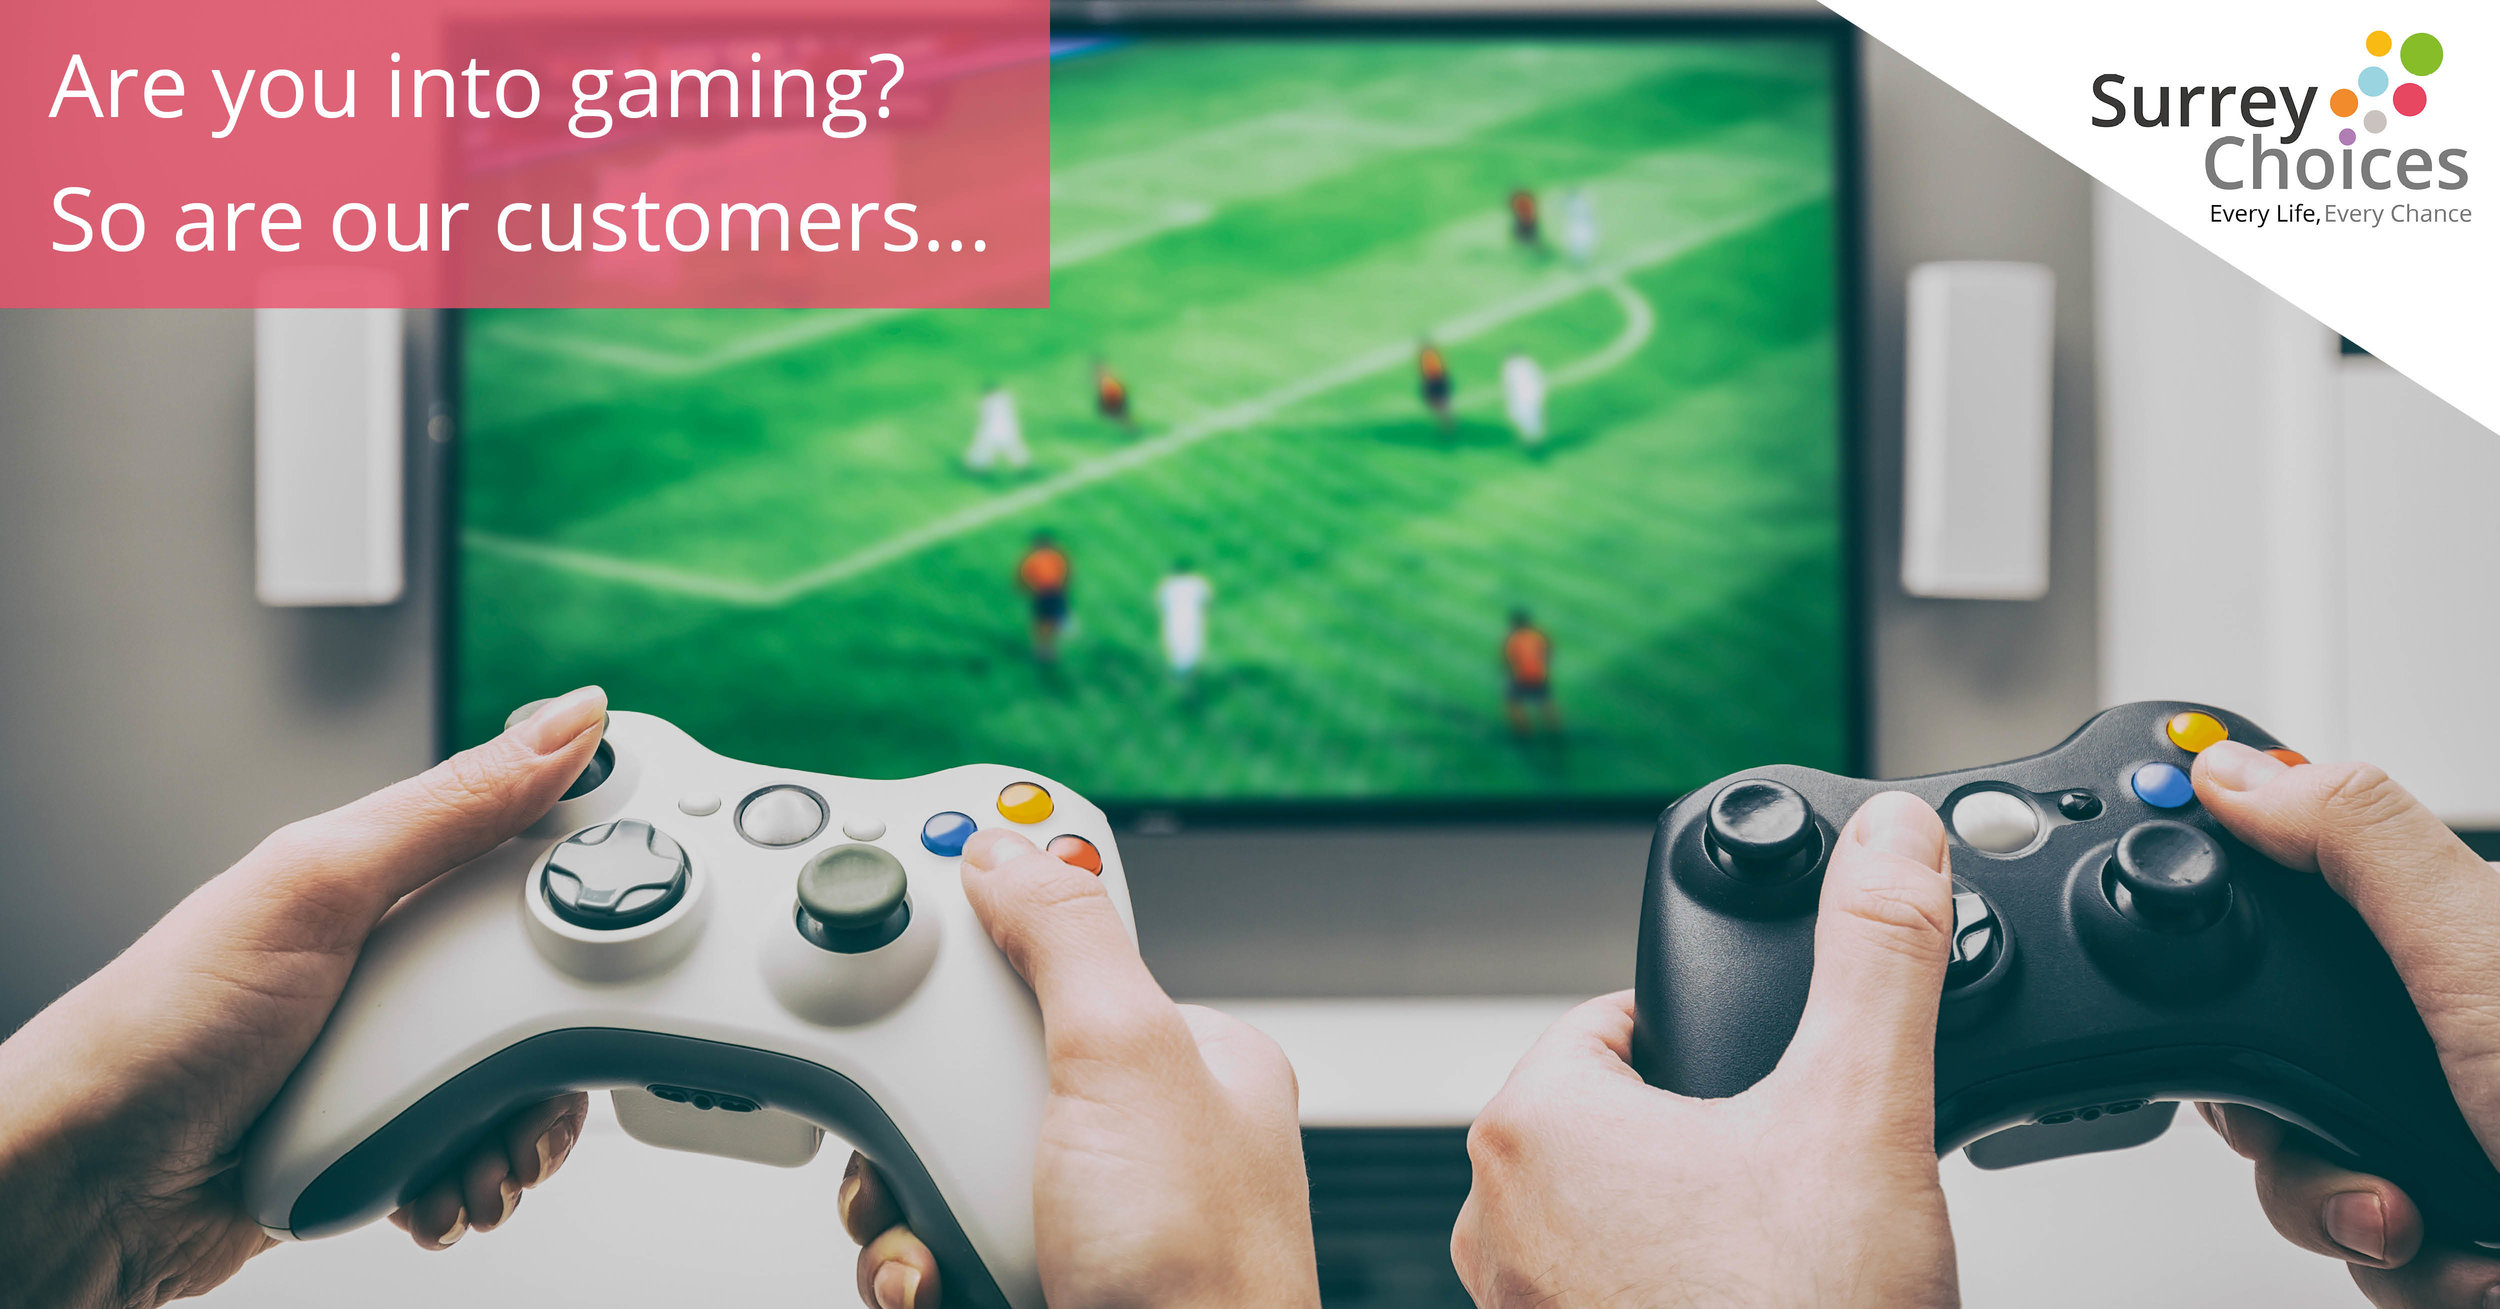 SC_Gaming_FB_advert_250917.jpg